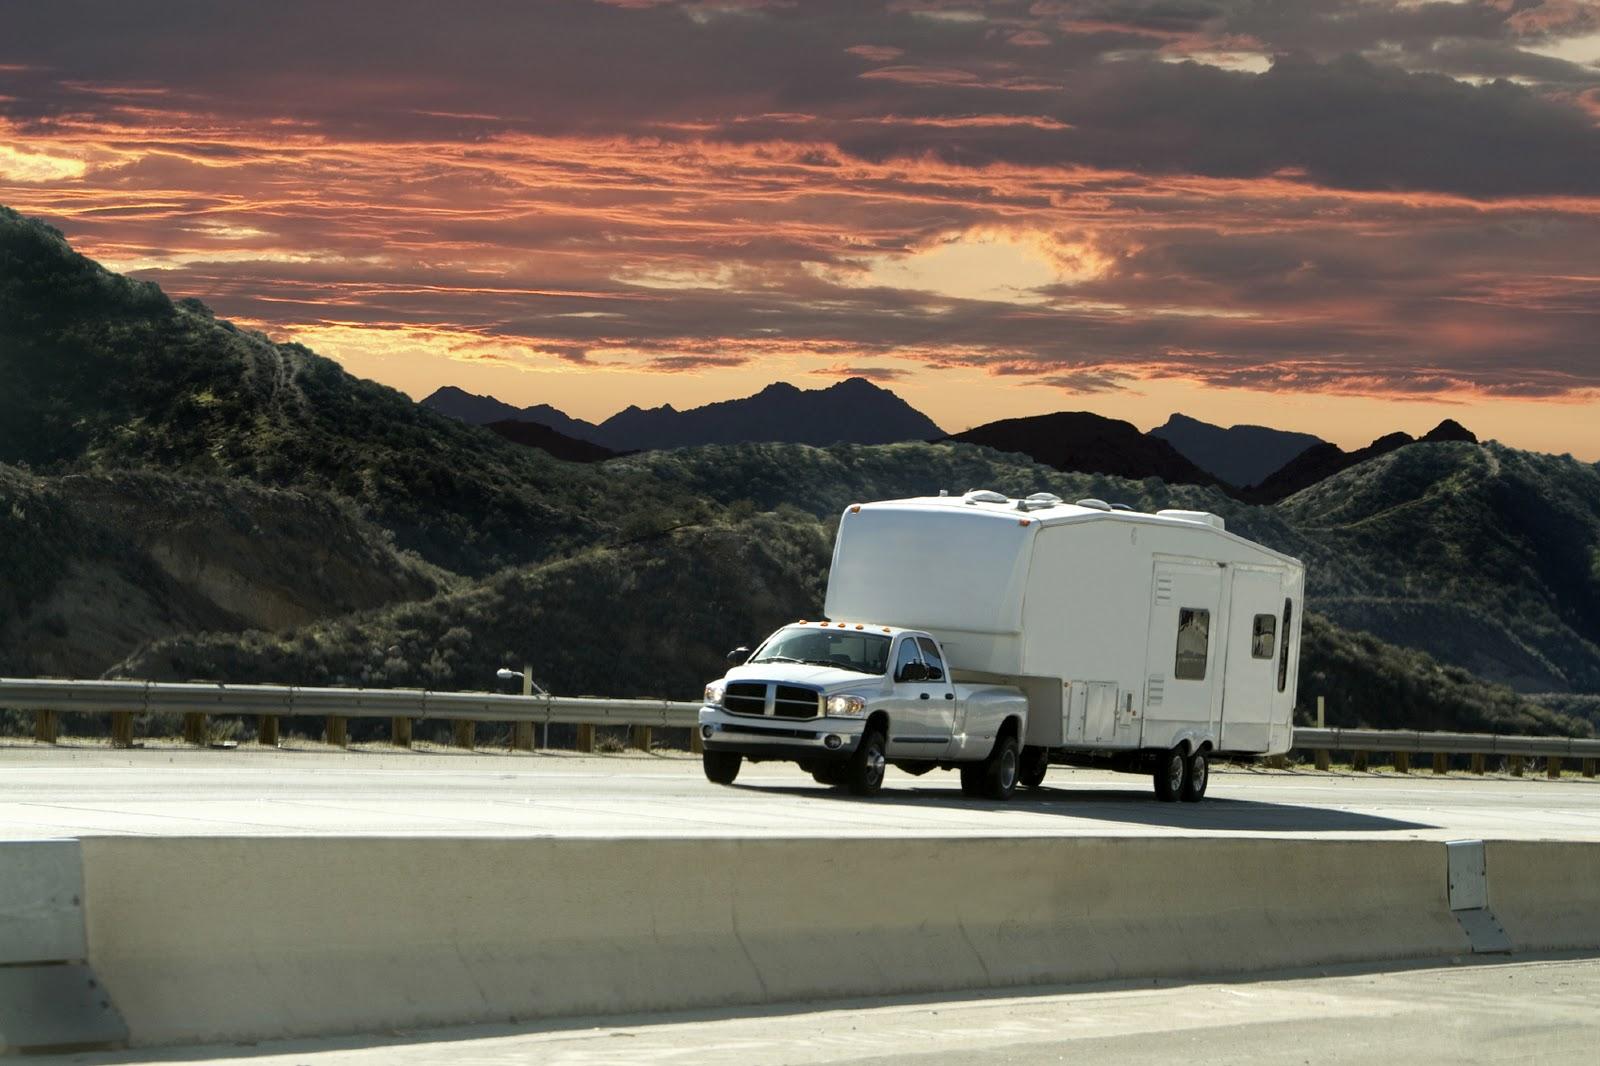 RV Types: 5th Wheel Travel Trailer